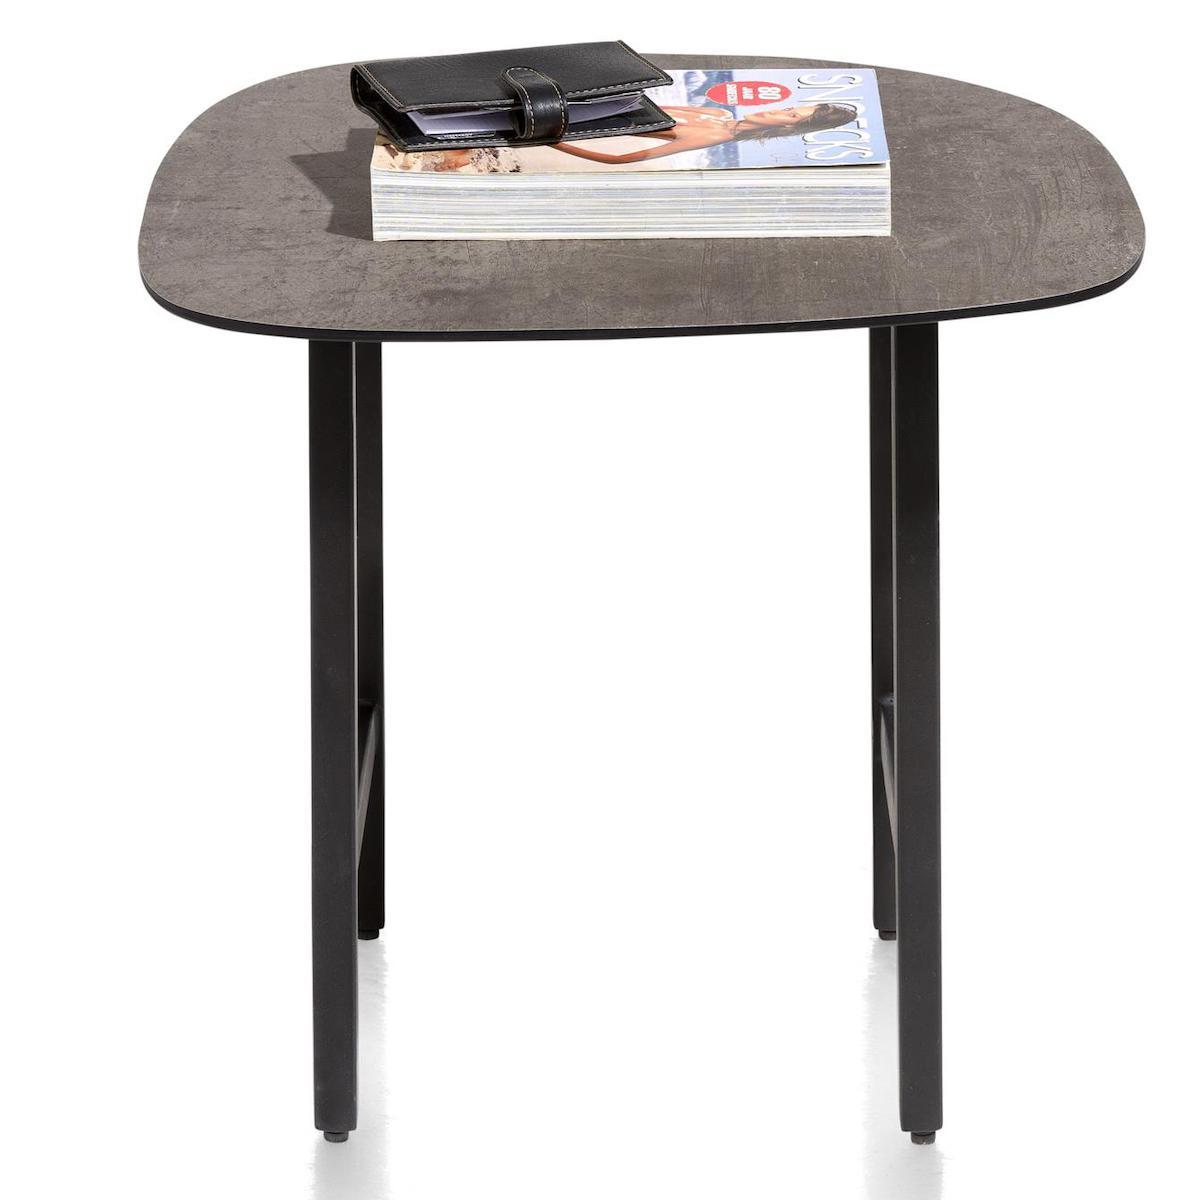 Table d'appoint 45x45cm FRESNO Xooon